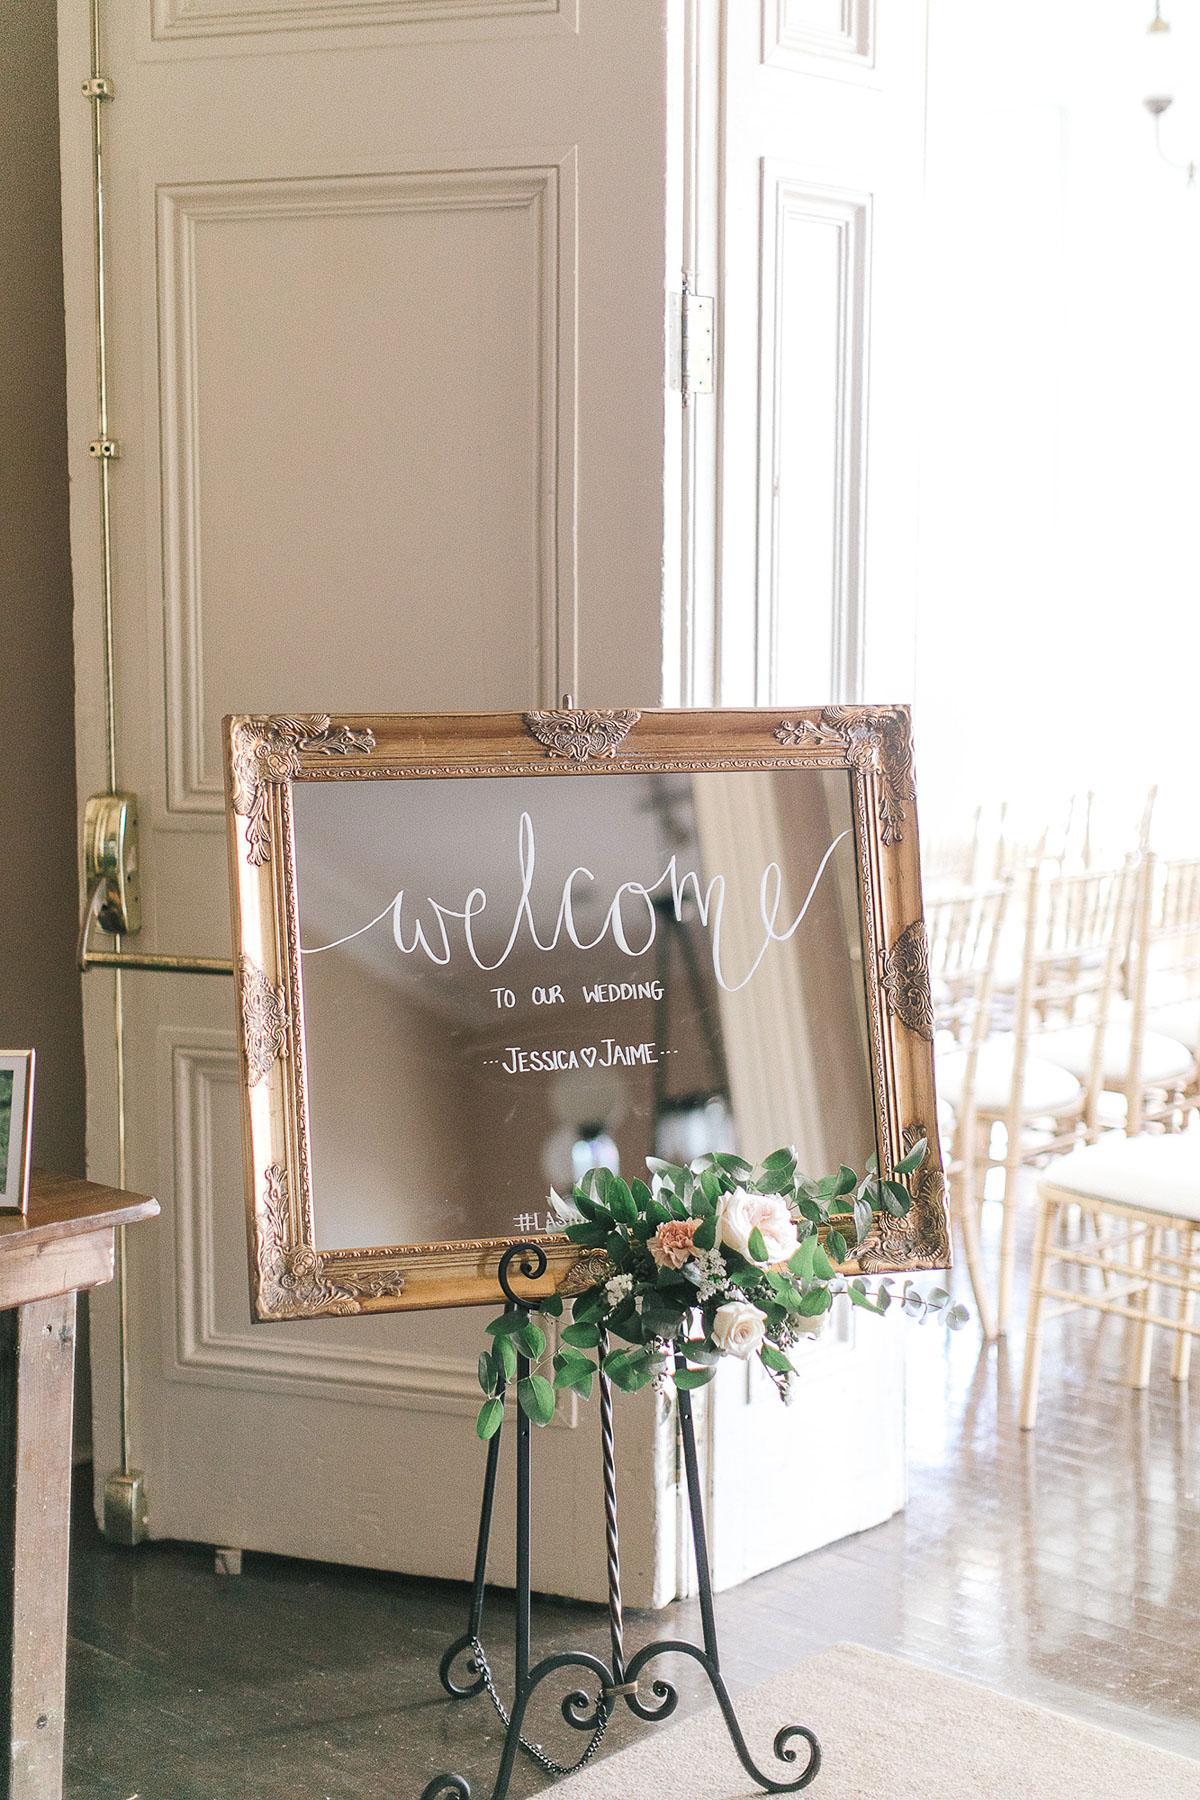 tamara-lockwood-photography-vineyard-bride-swish-list-the-old-courthouse-niagara-on-the-lake-wedding-49.jpg